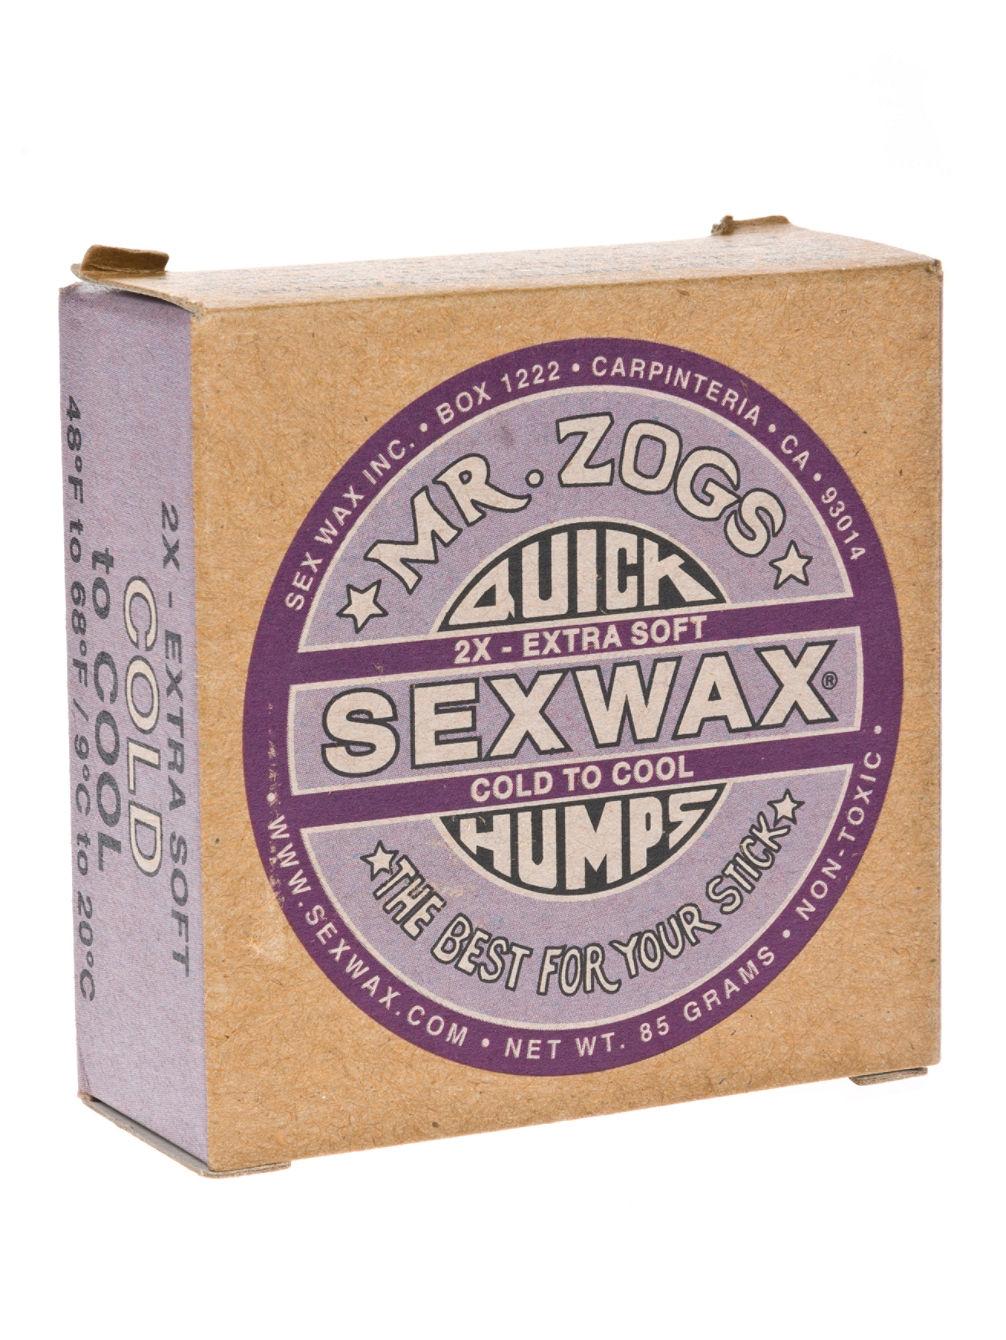 sex-wax-quick-humps-purple-extra-soft